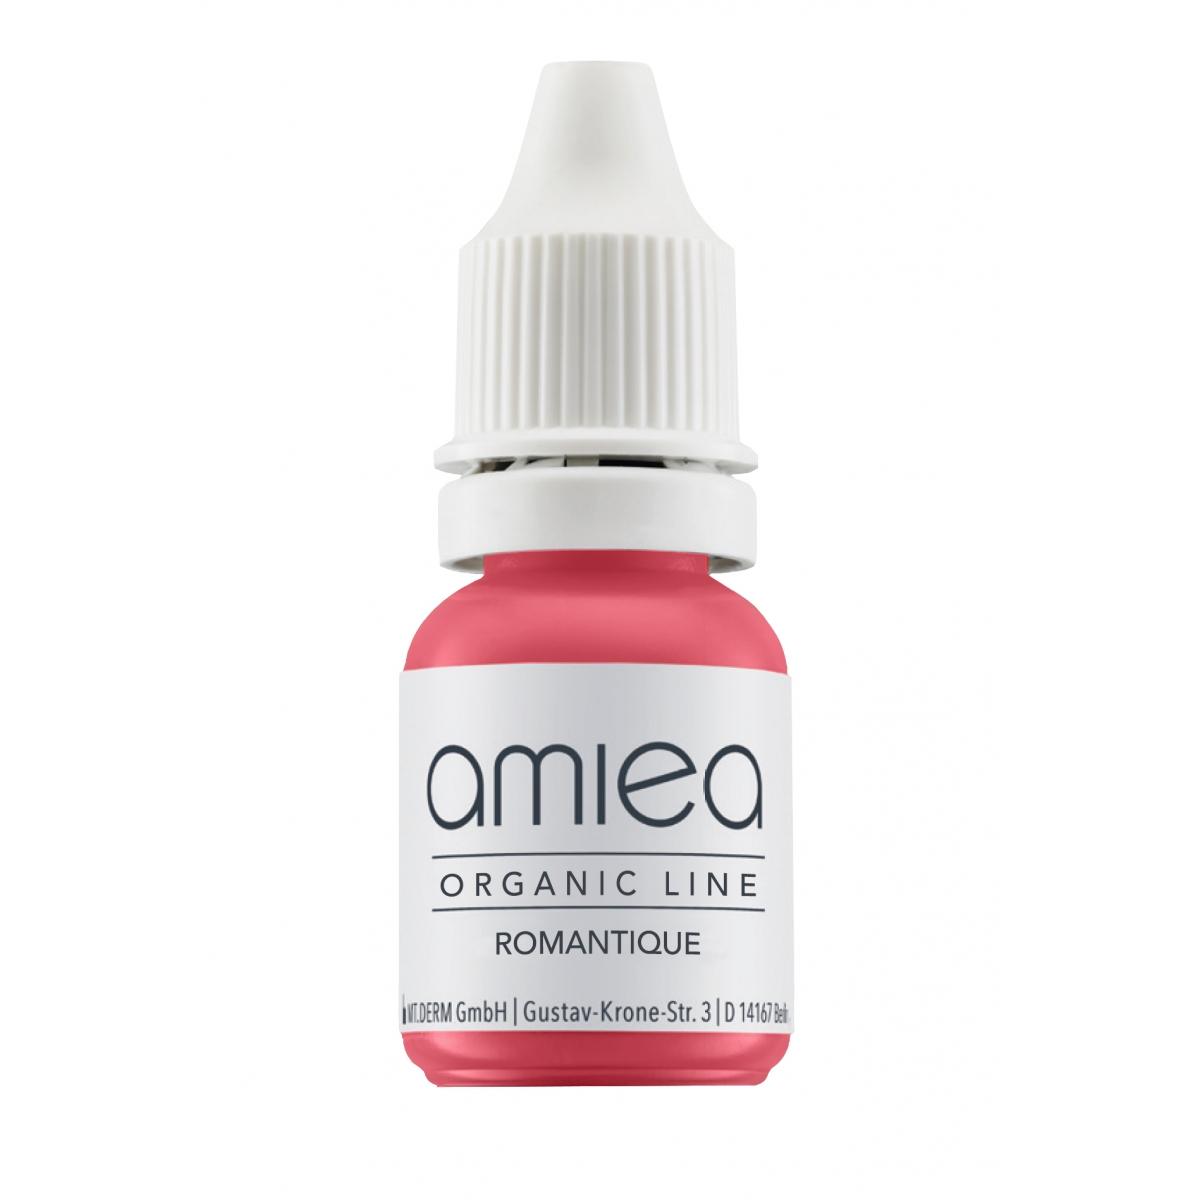 ORGANIC LINE (5ml)  - PIGMENT ROMANTIQUE ORGANICLINE AMIEA (5 ml)